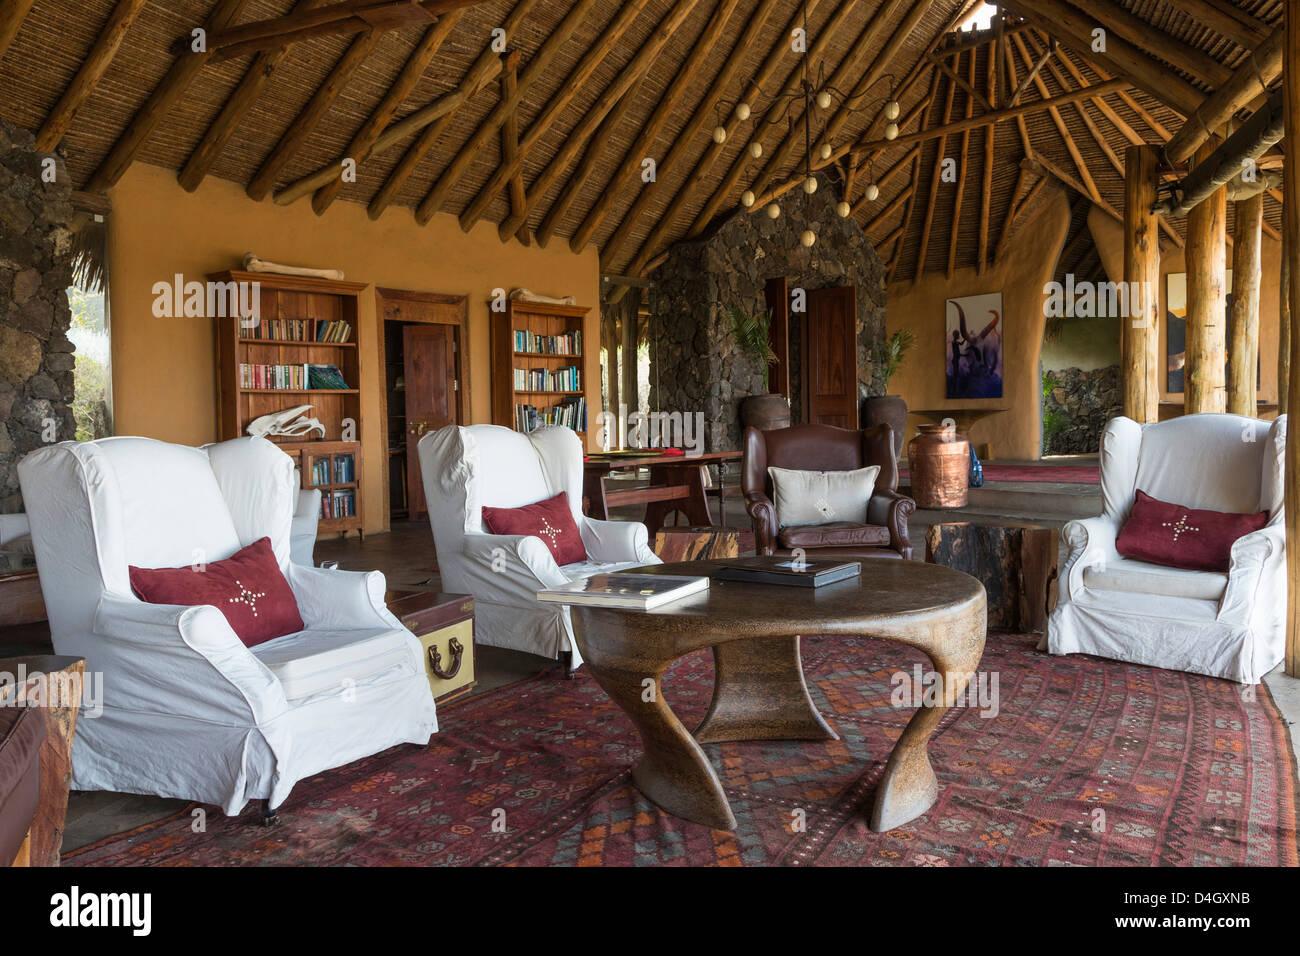 Ol Donyo Wuas Lodge, Chyulu Hills, Kenya, East Africa - Stock Image